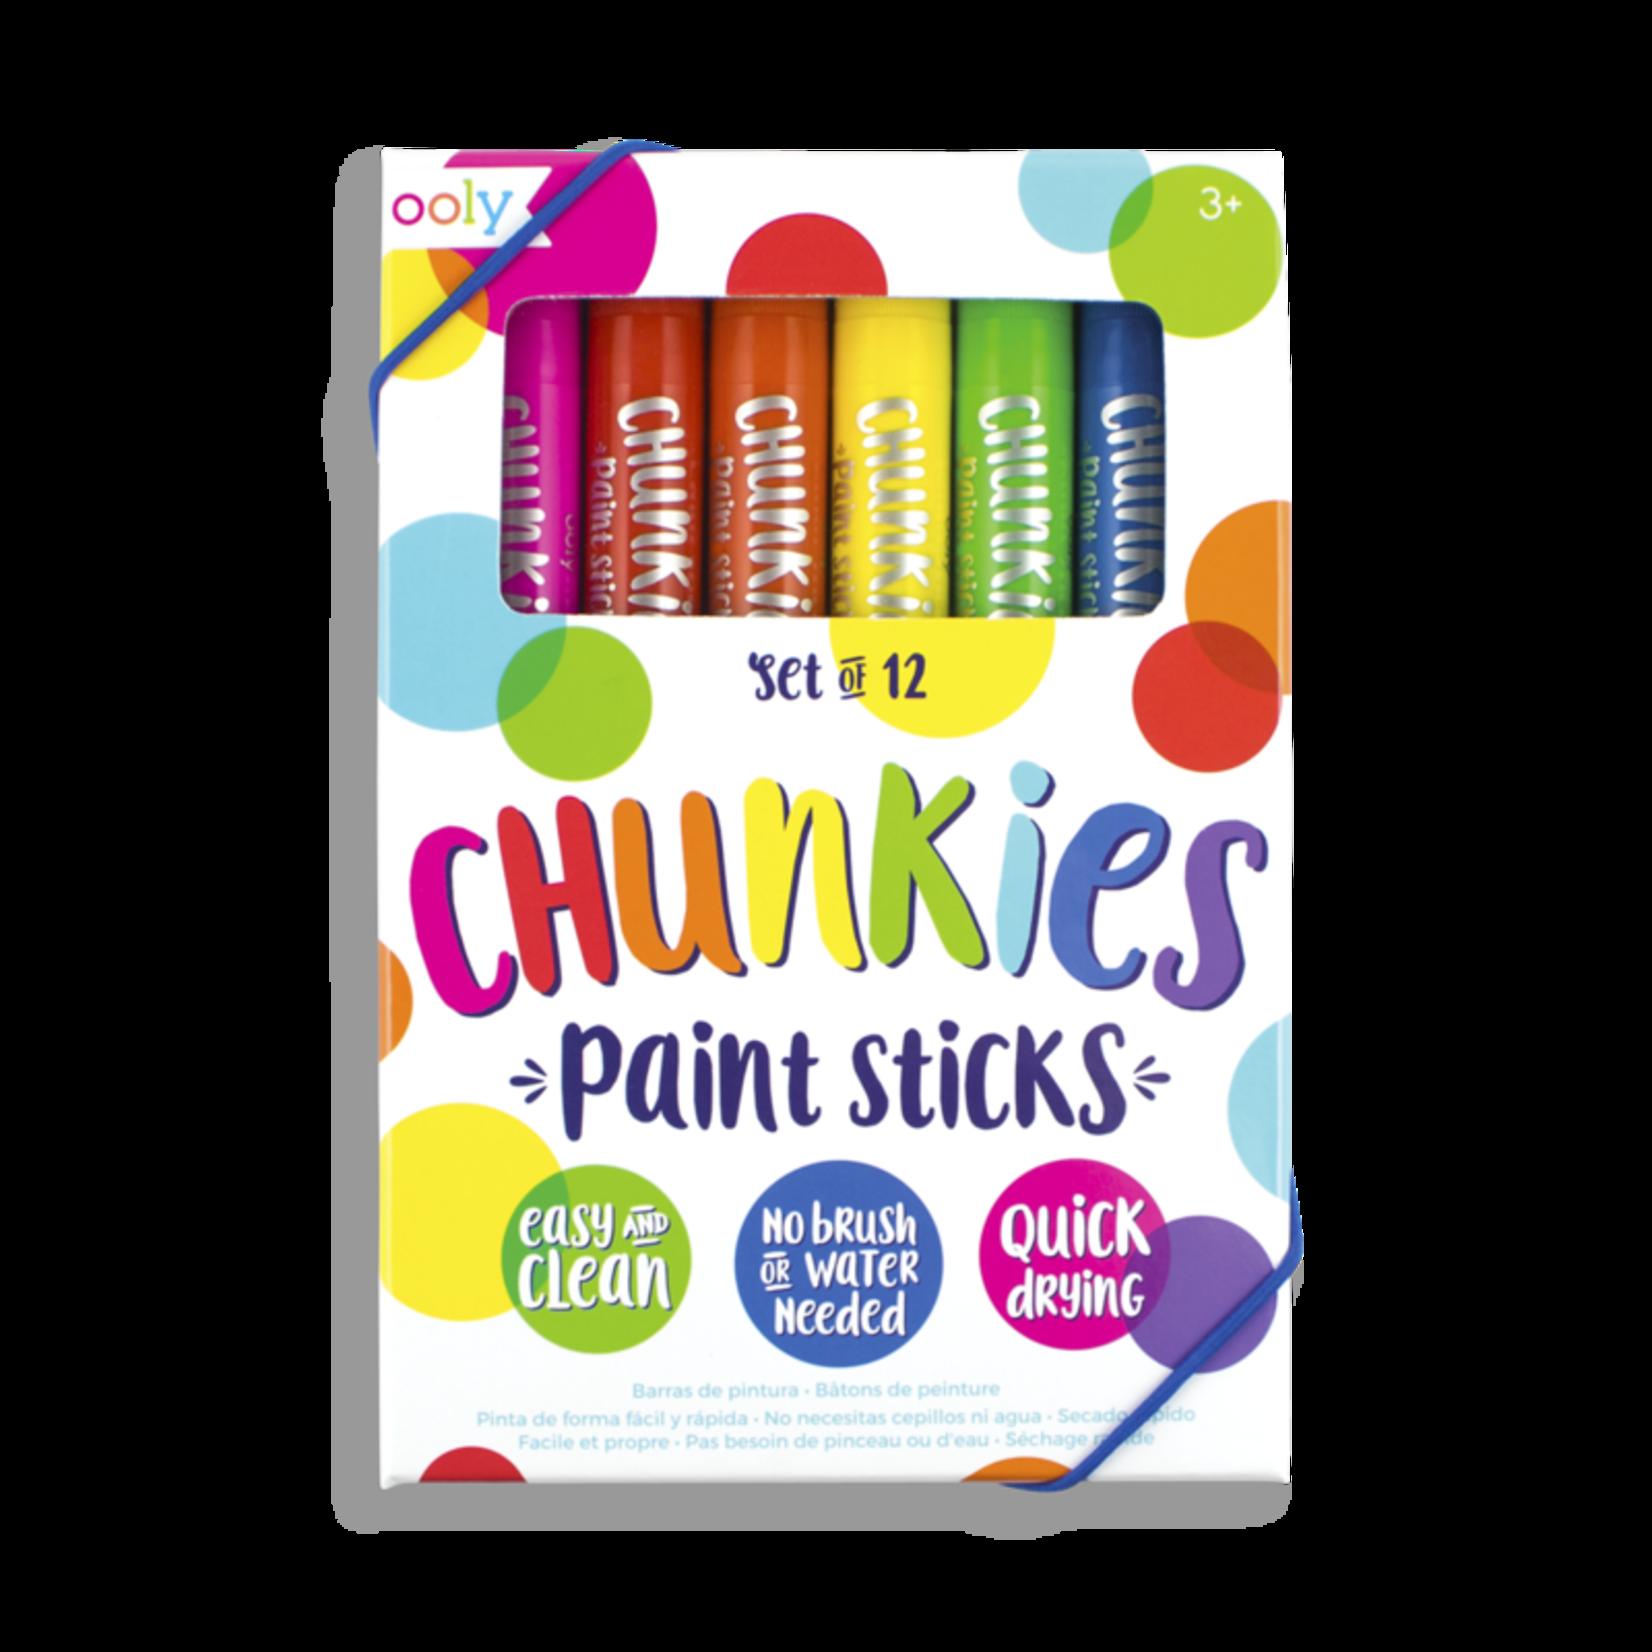 Ooly Chunkies Paint Sticks - Original Pack (Set of 12)